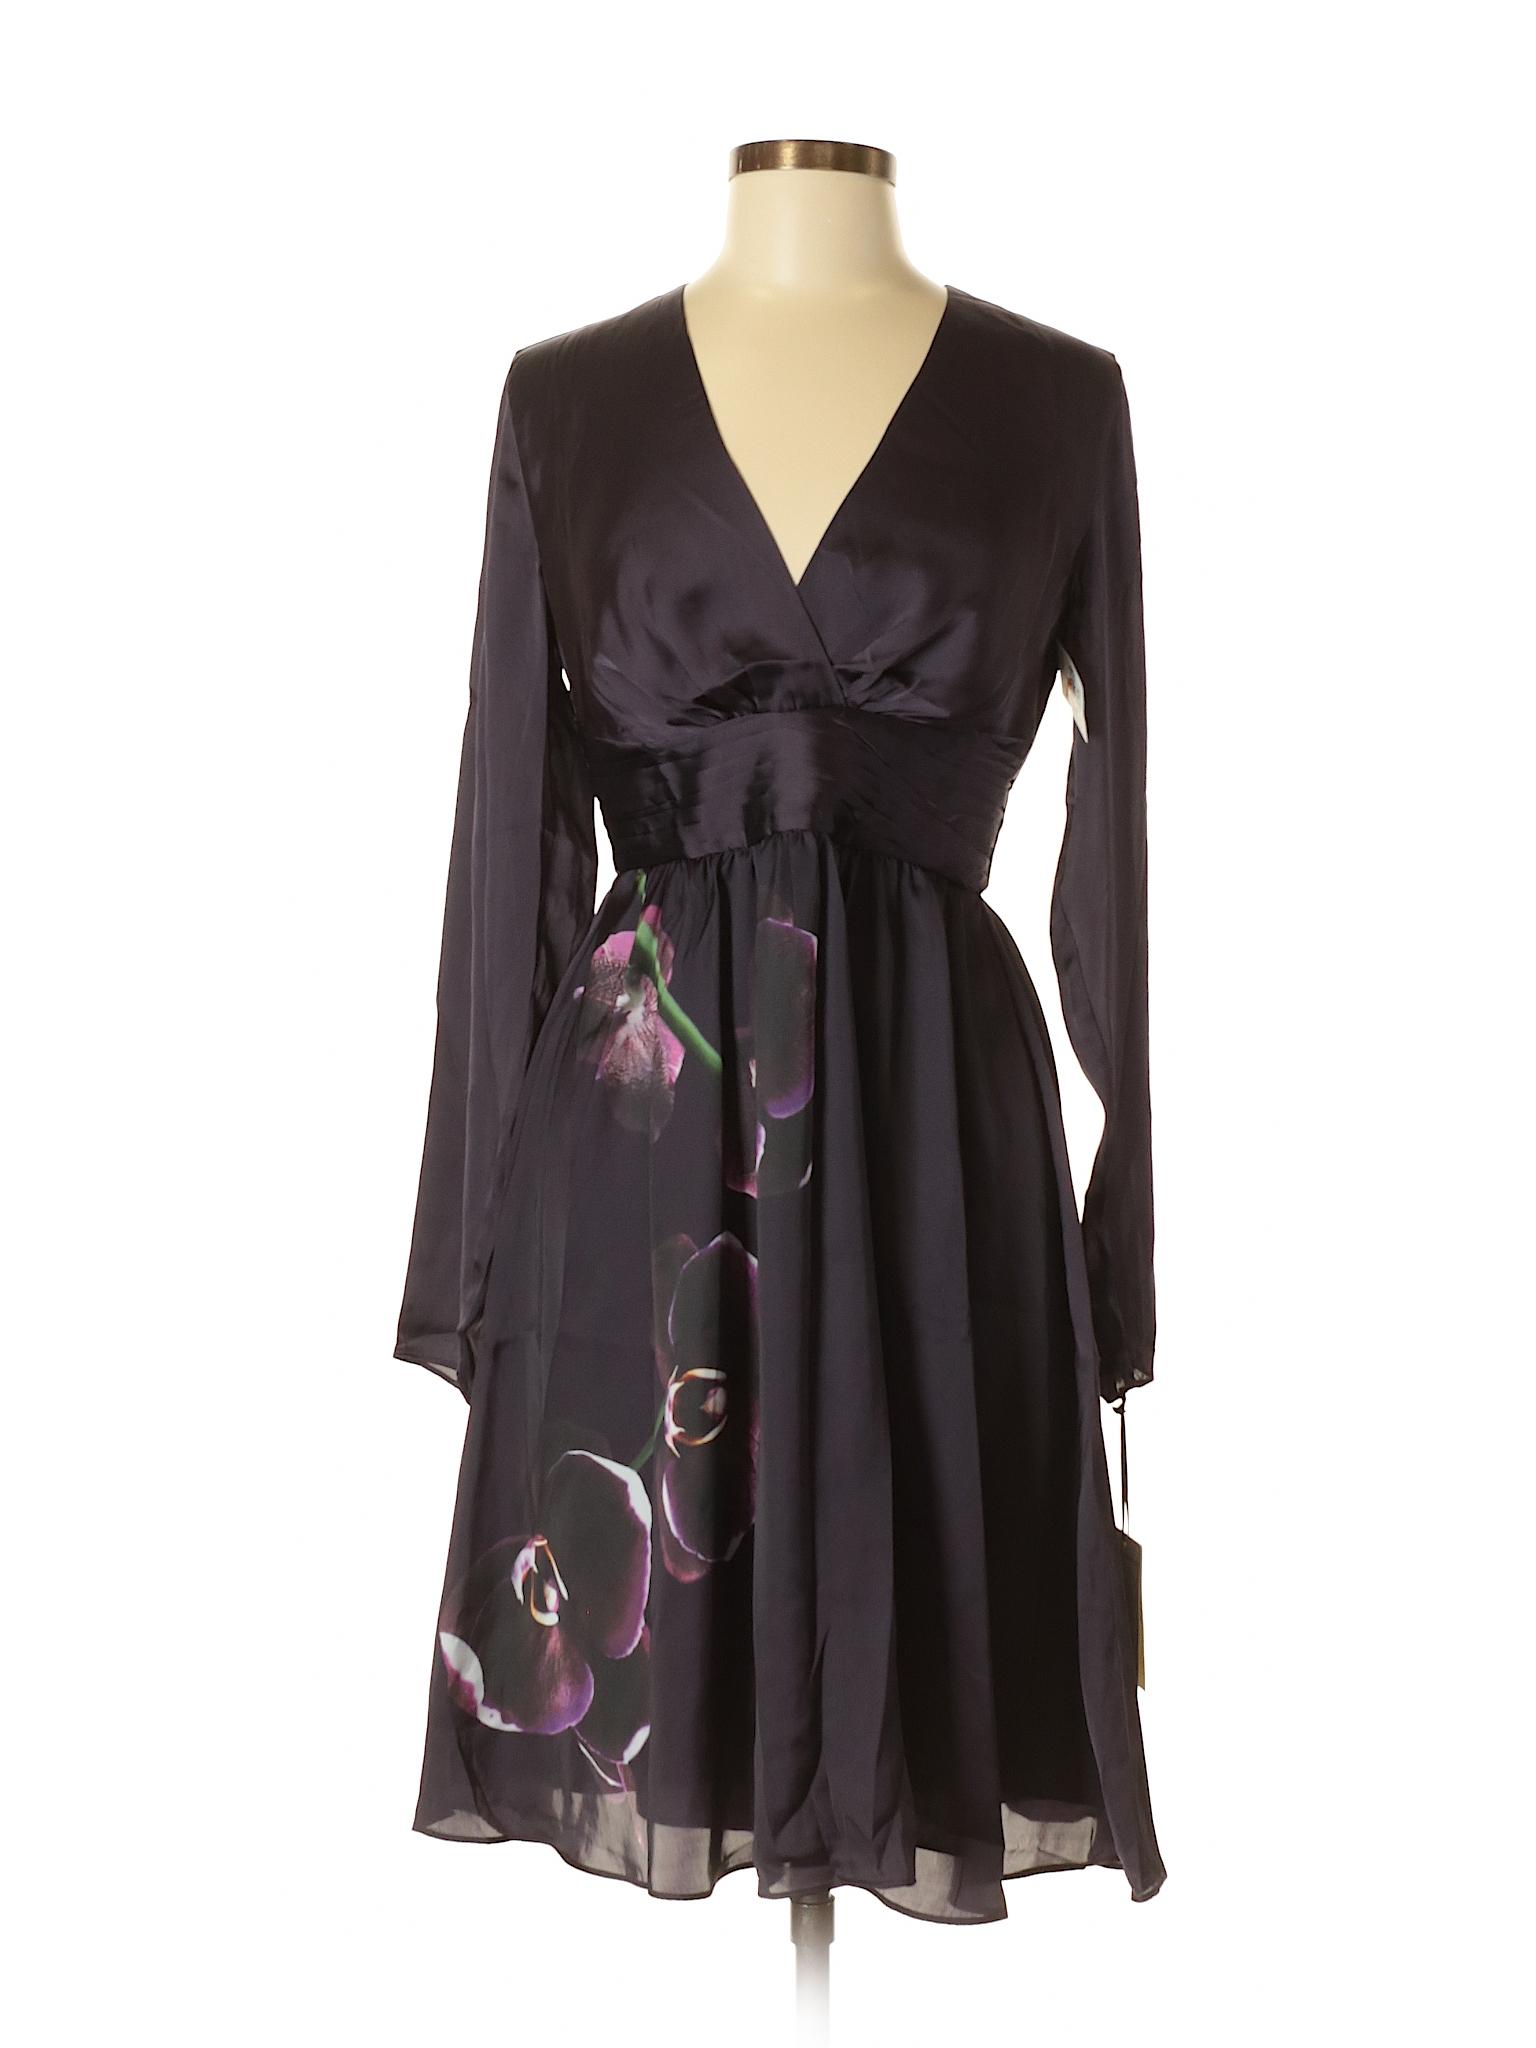 for Dress Altuzarra Selling Casual Target zqB51SwP